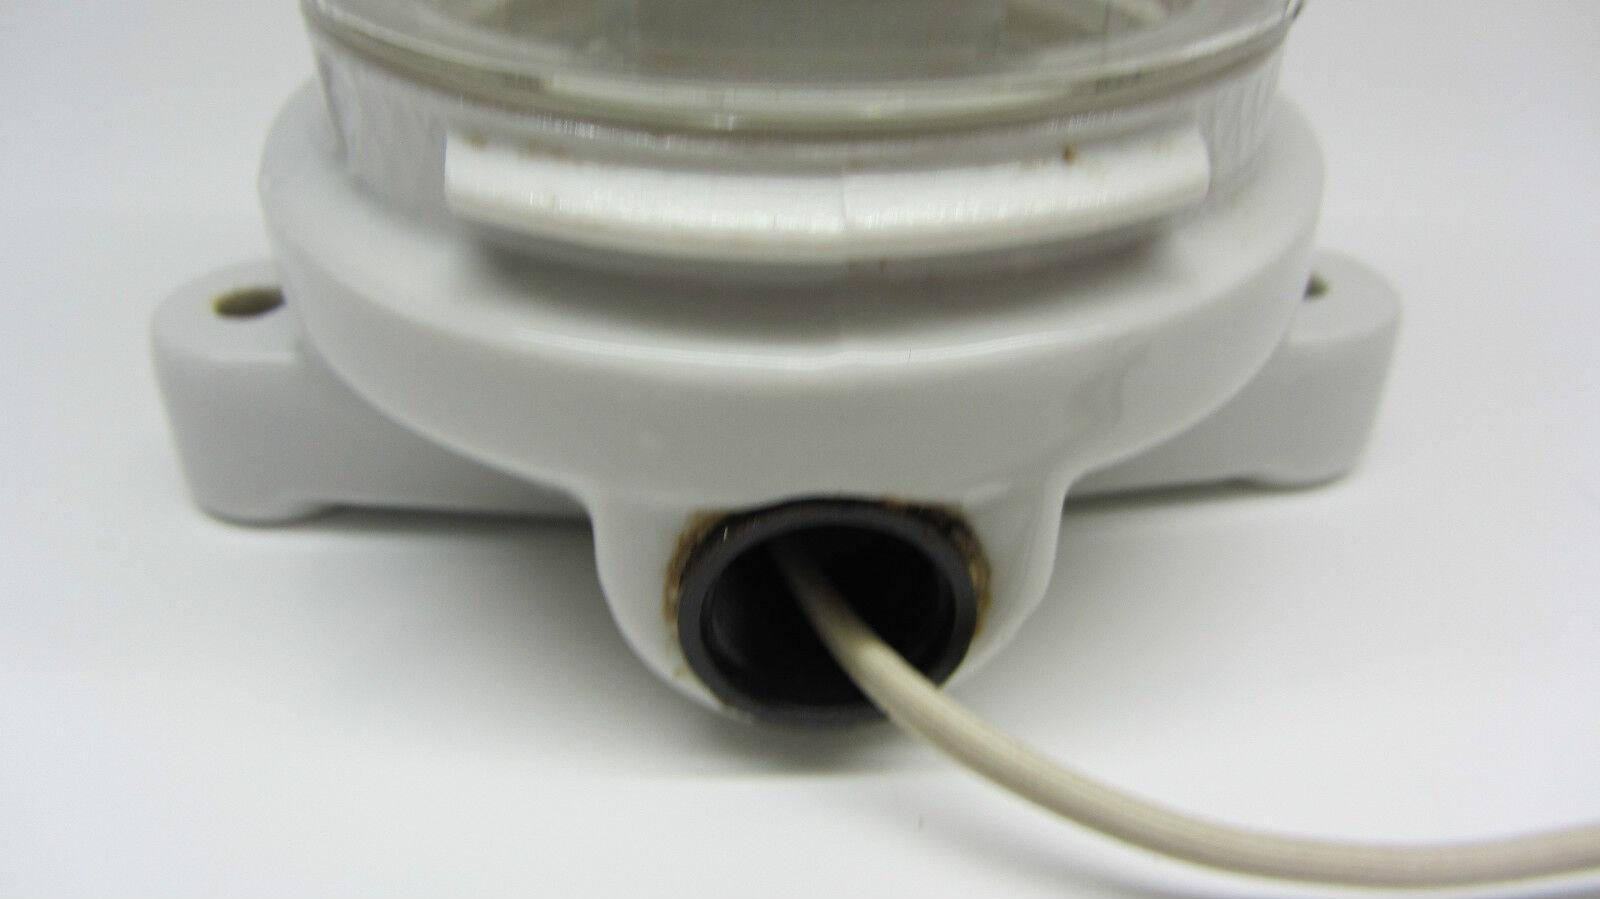 keller lampe hoflampe industrielampe kellerlampe porzellan wandlampe decken eur 89 00. Black Bedroom Furniture Sets. Home Design Ideas